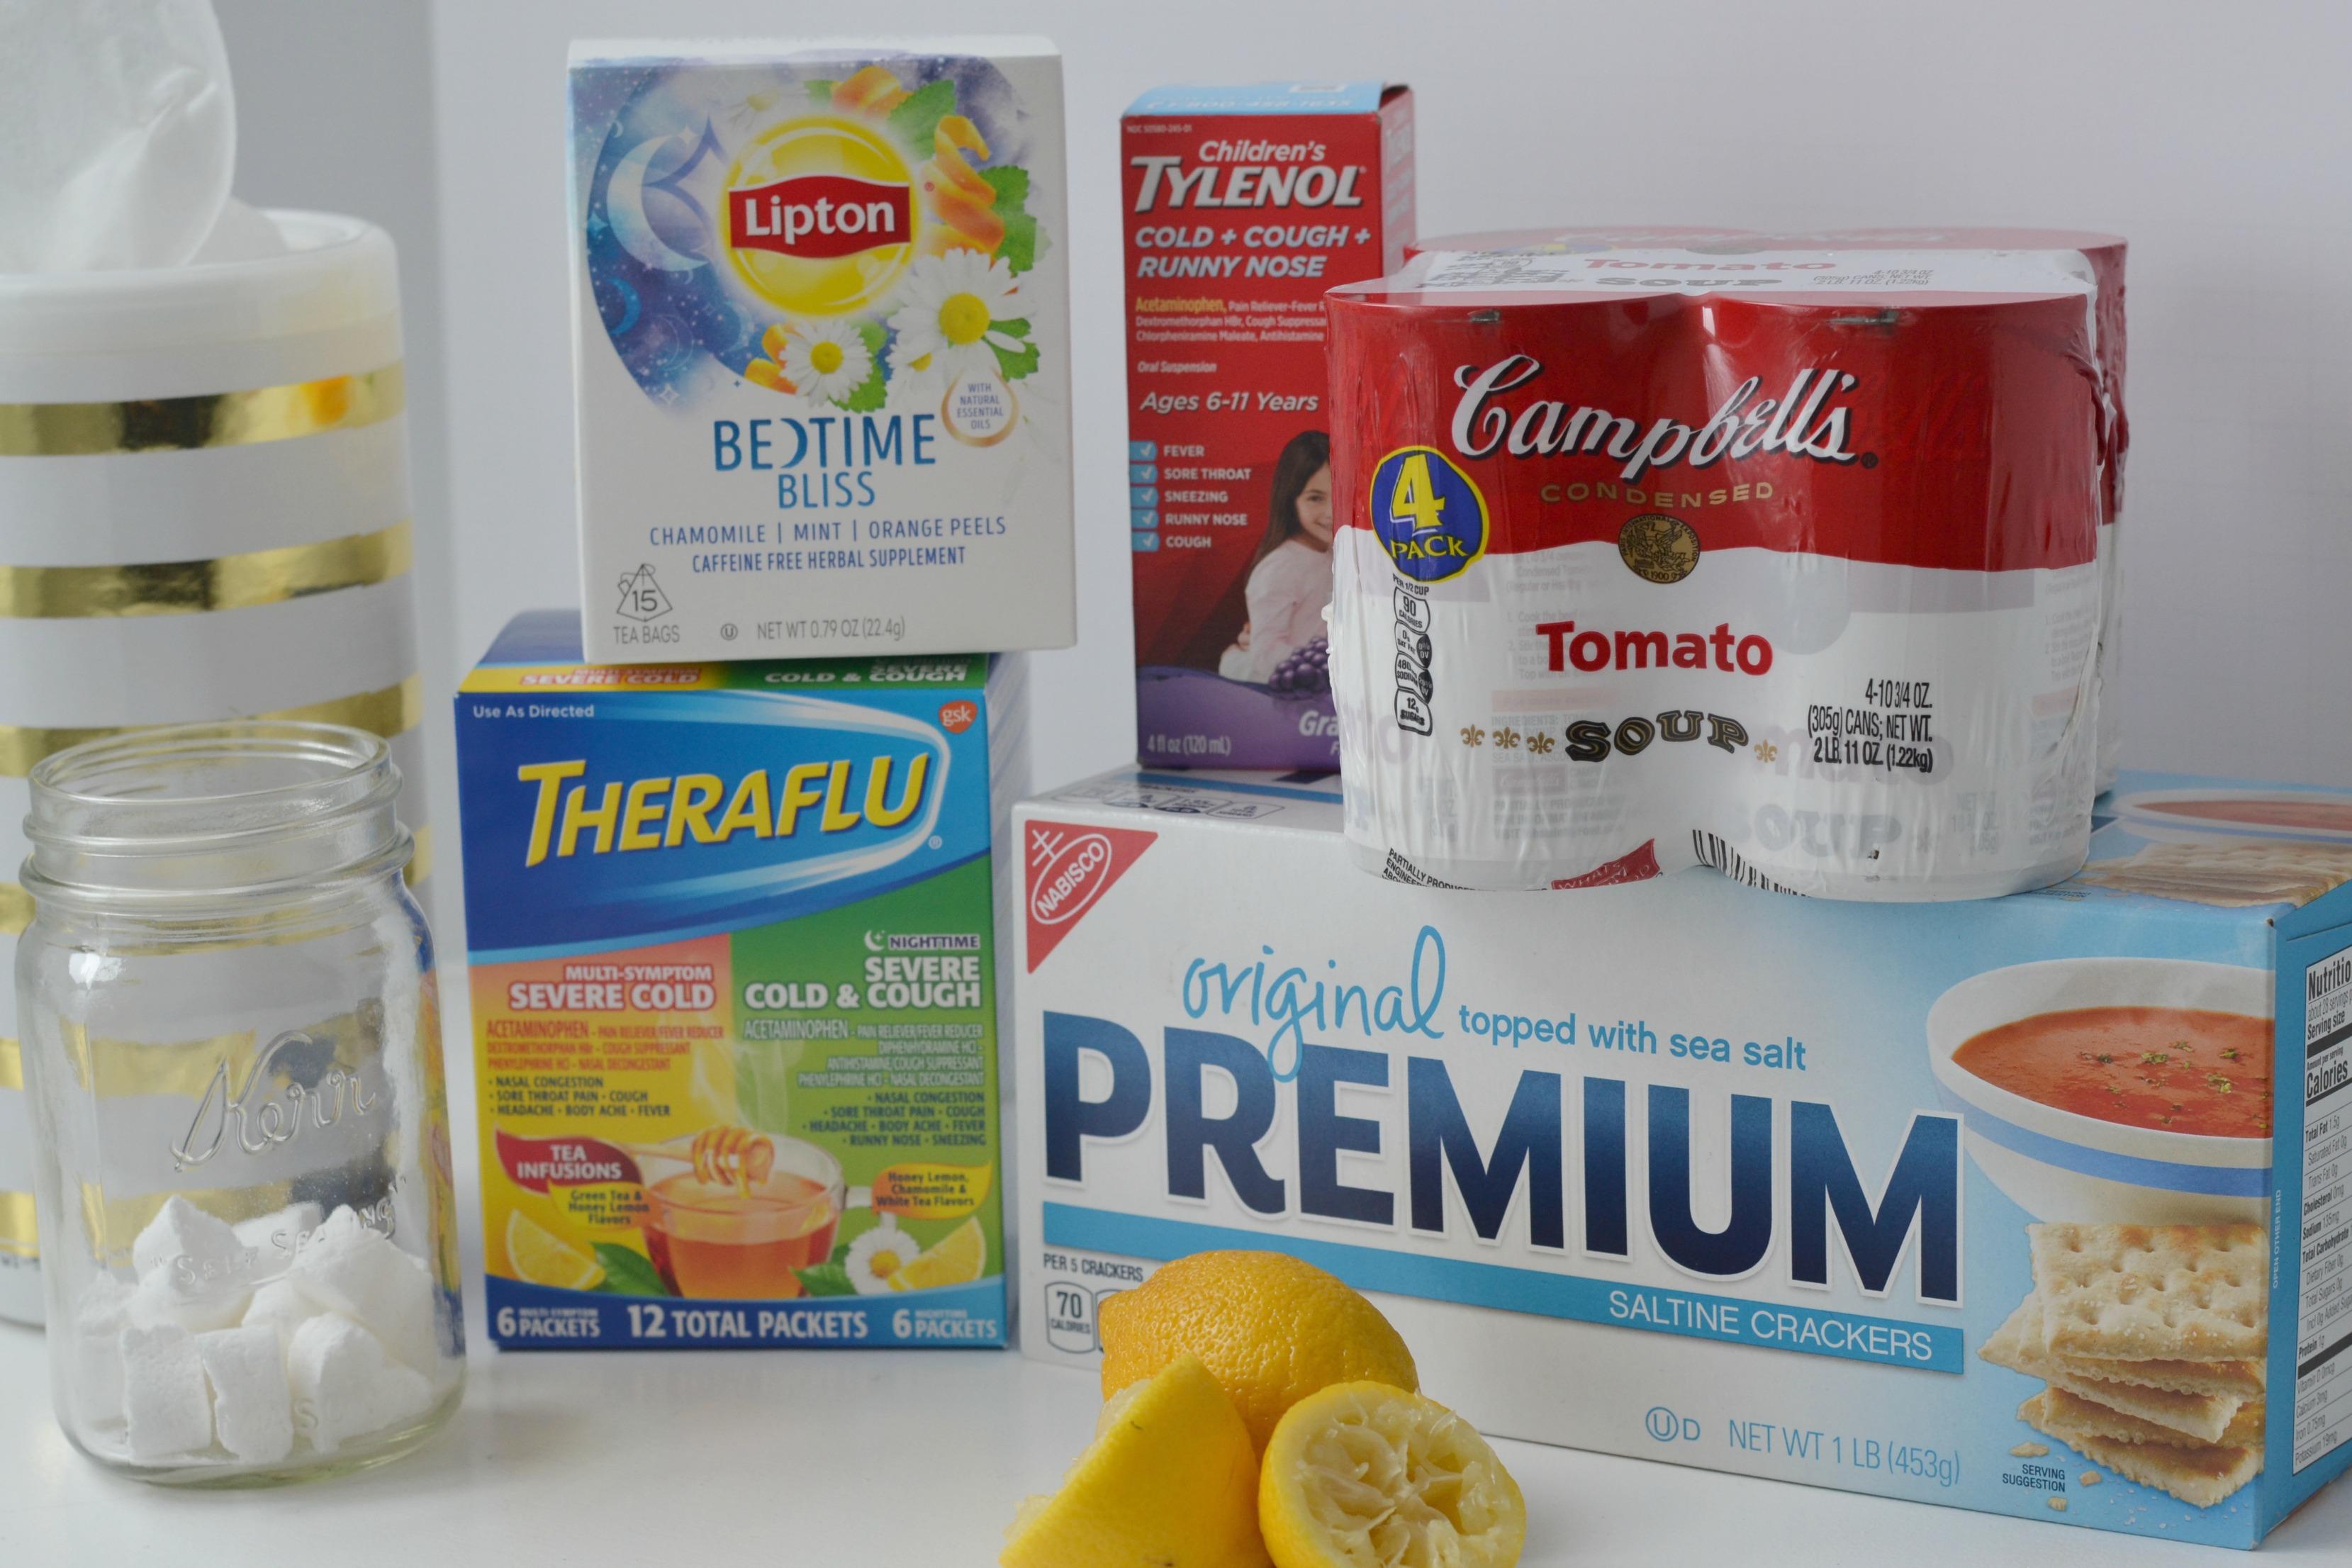 Get Well Kit Supplies from Kroger